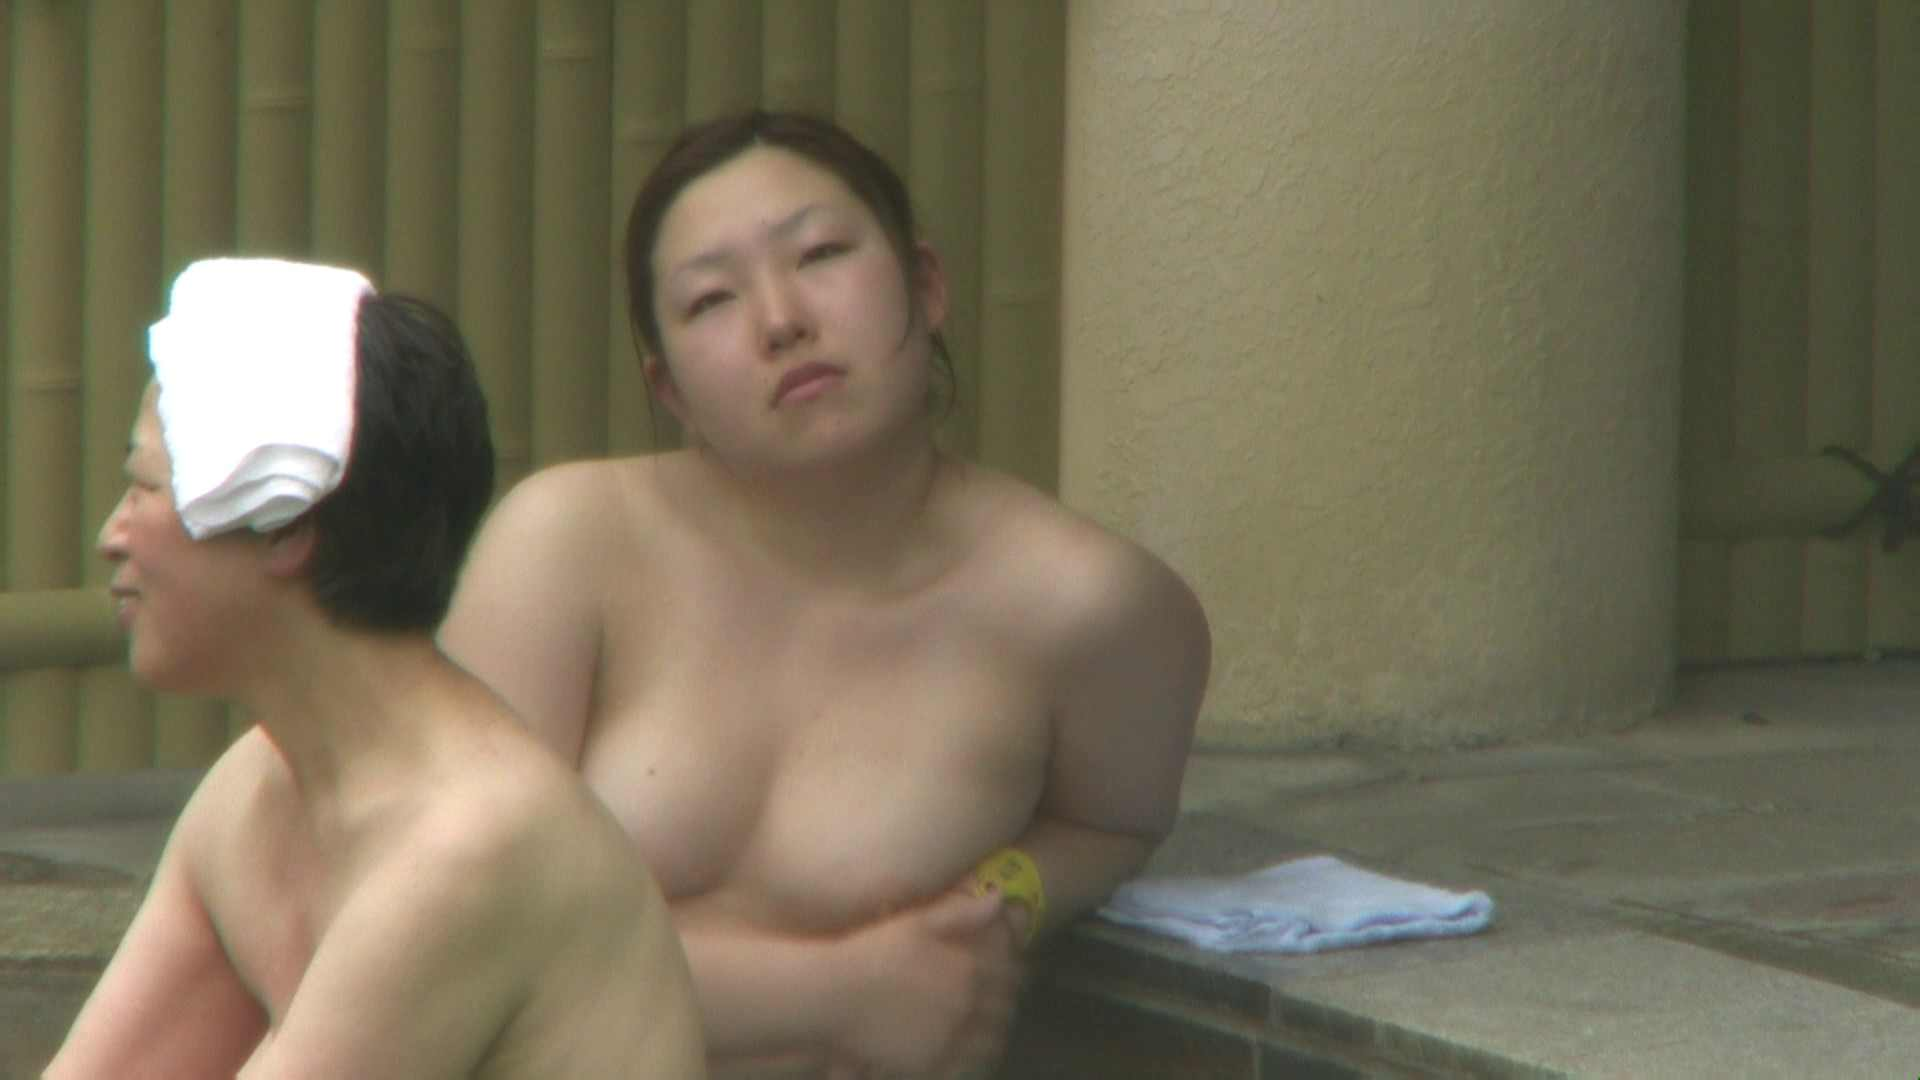 Aquaな露天風呂Vol.72【VIP限定】 露天風呂編 | 盗撮シリーズ  98PIX 35